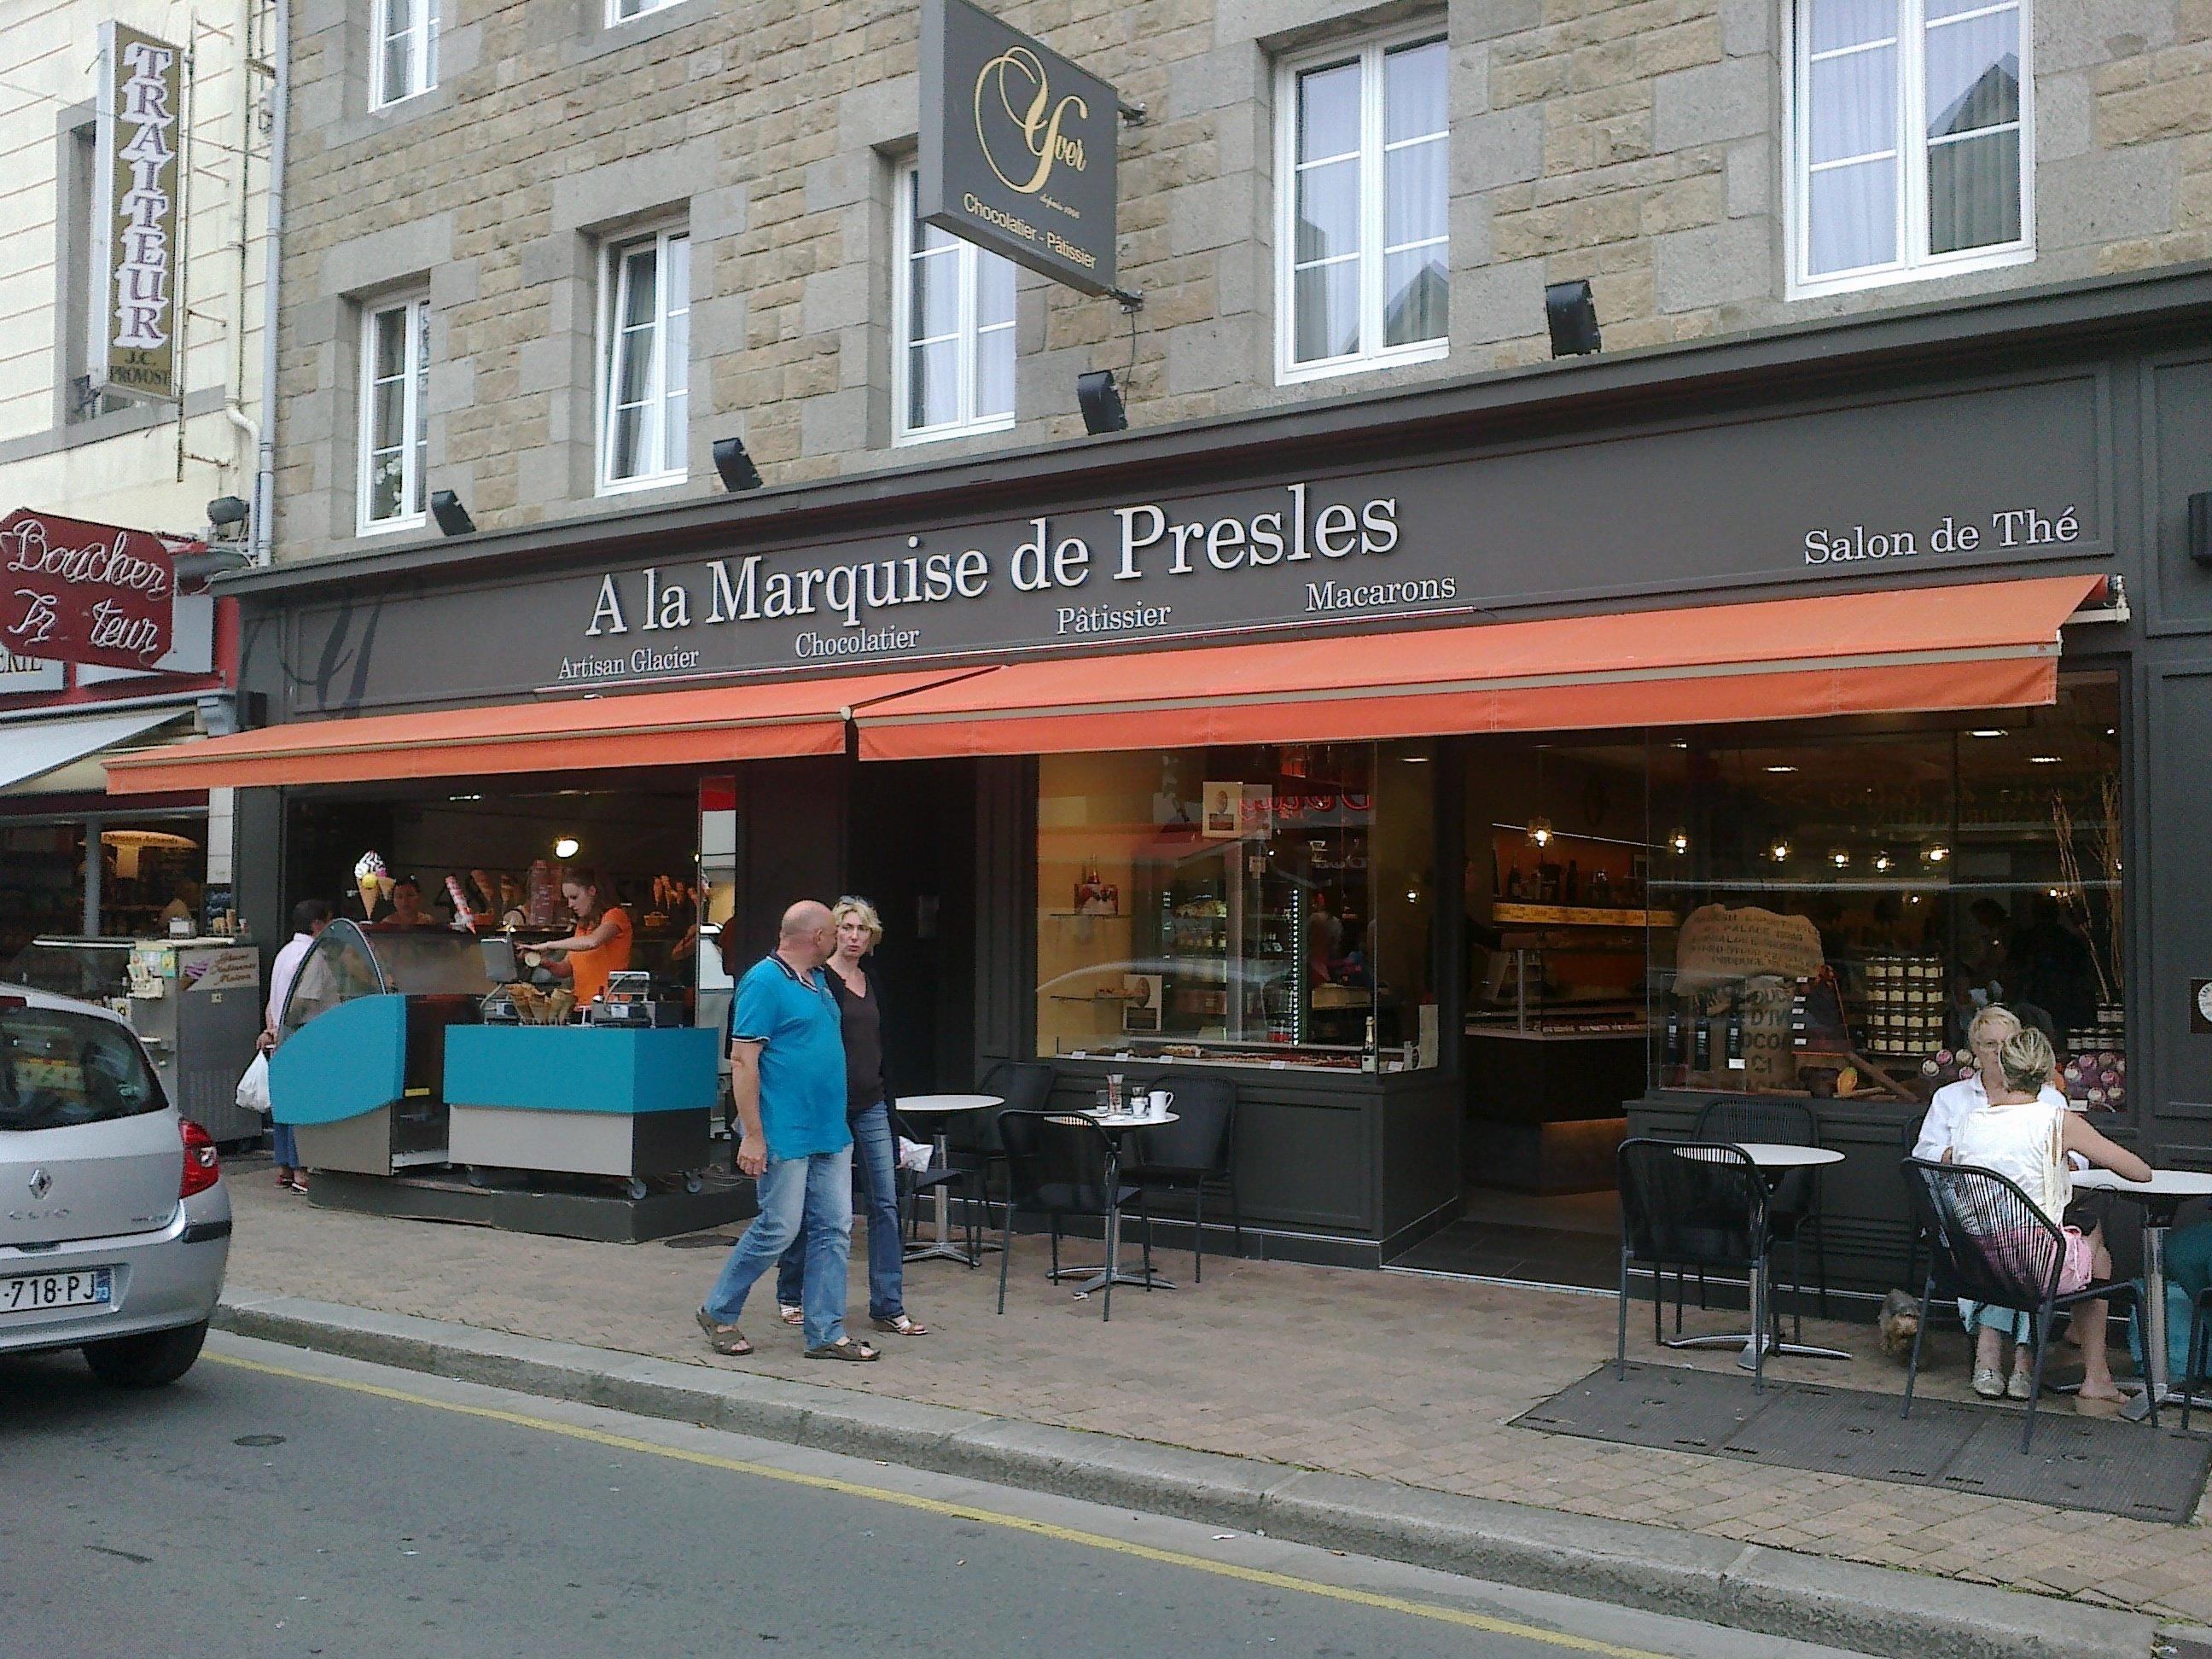 A la Marquise de Presles